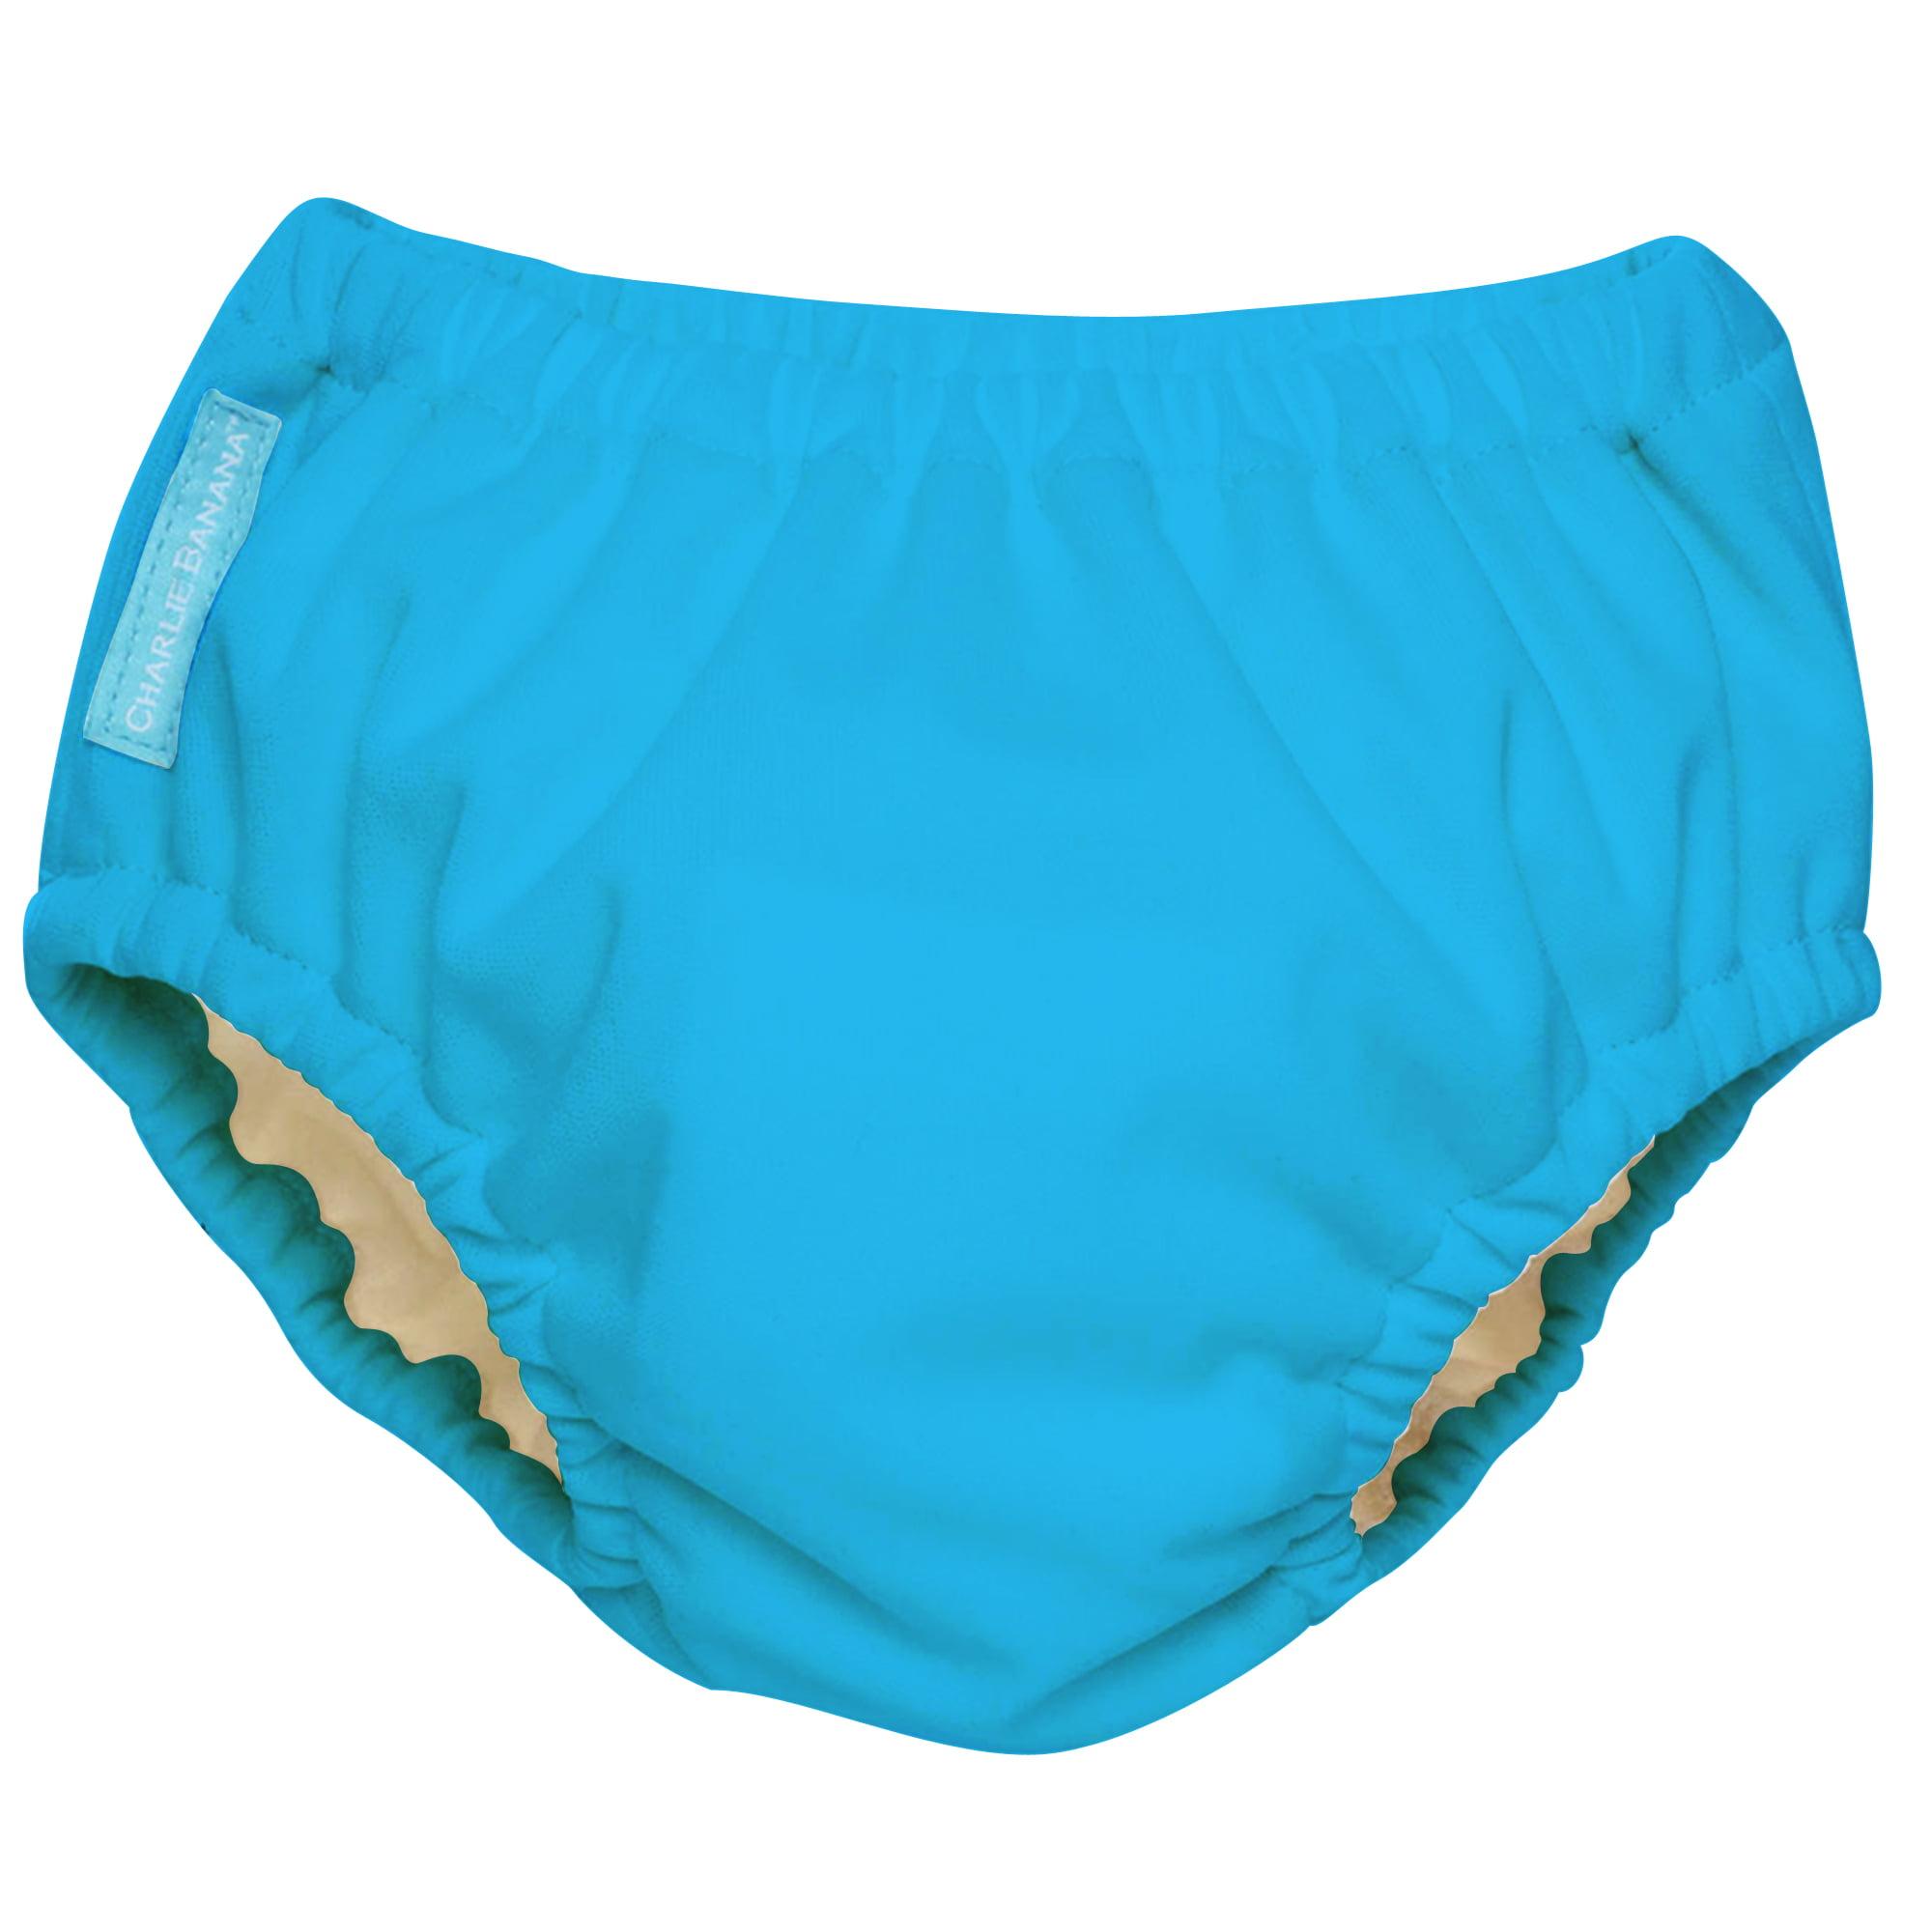 Charlie Banana Extraordinary Training Pants, Turquoise